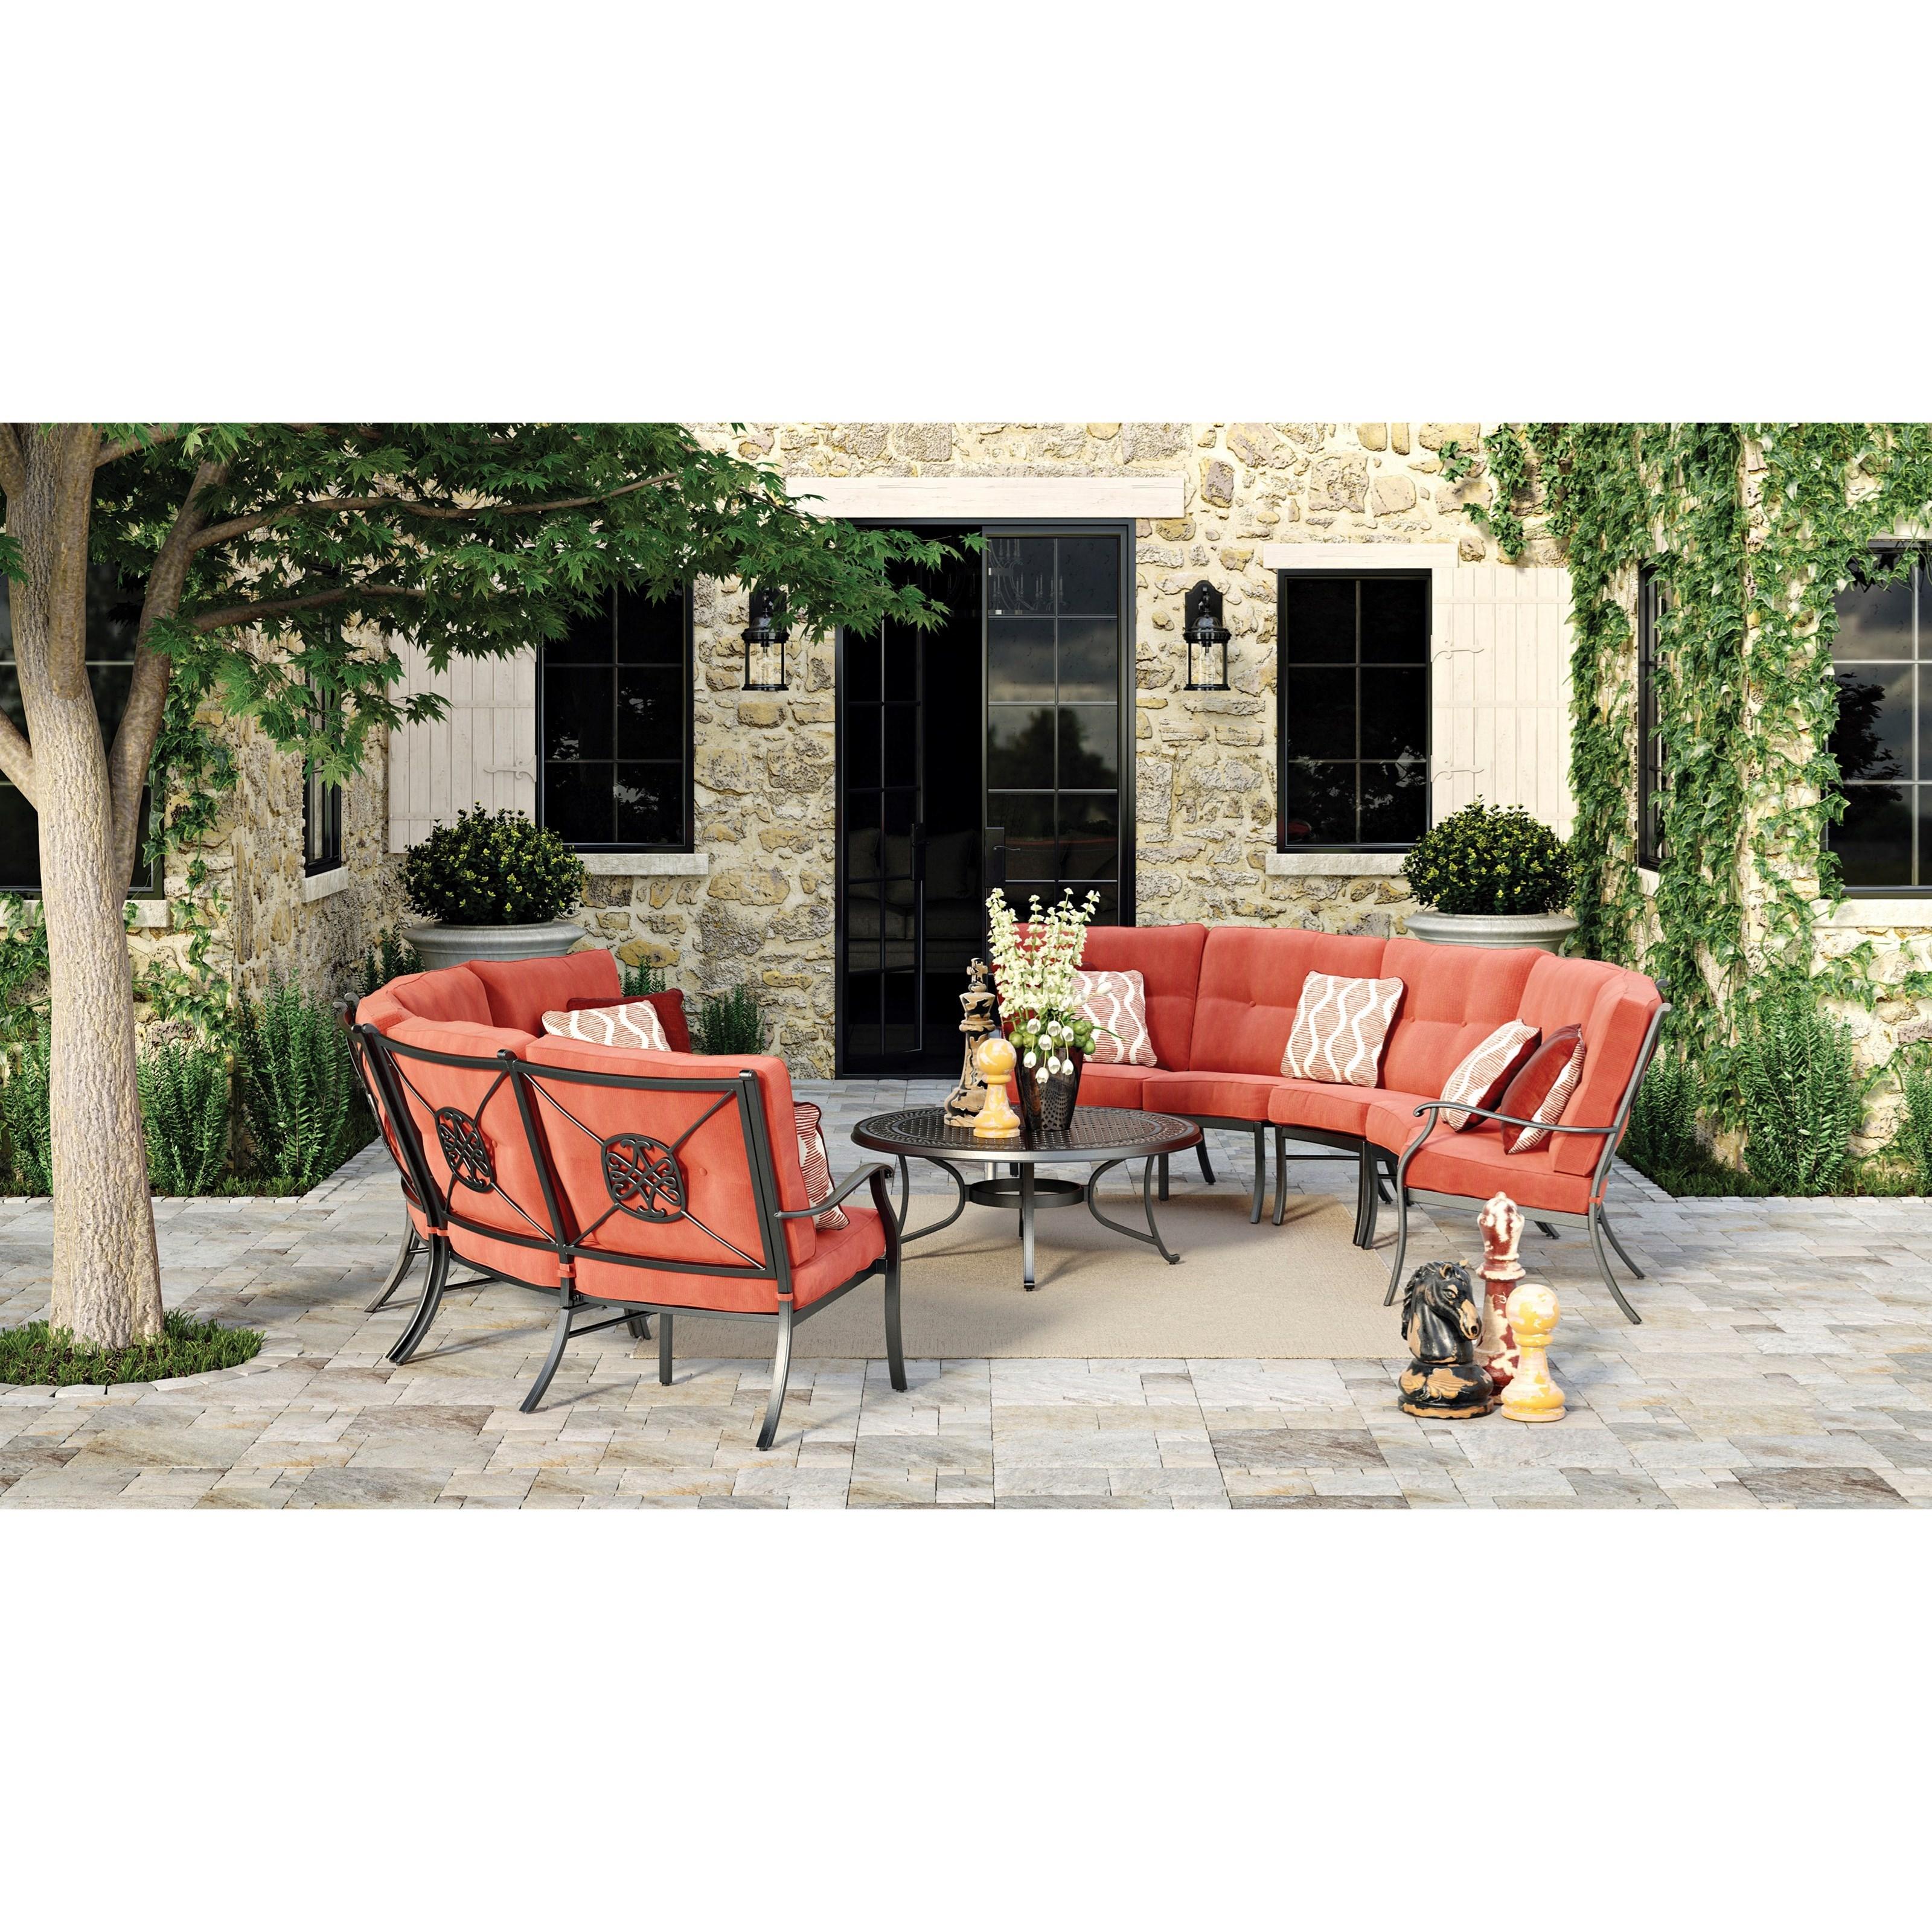 Burnella Outdoor Conversation Set by Signature Design by Ashley at Lapeer Furniture & Mattress Center